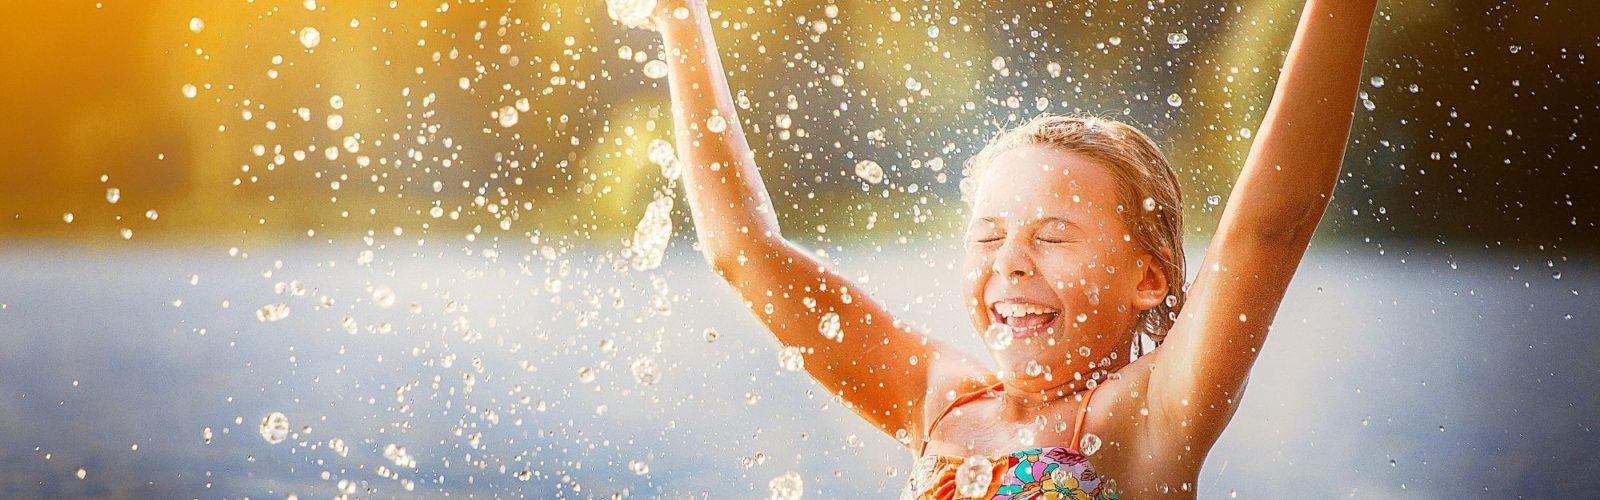 Shutterstock 1110989765 Edit resize